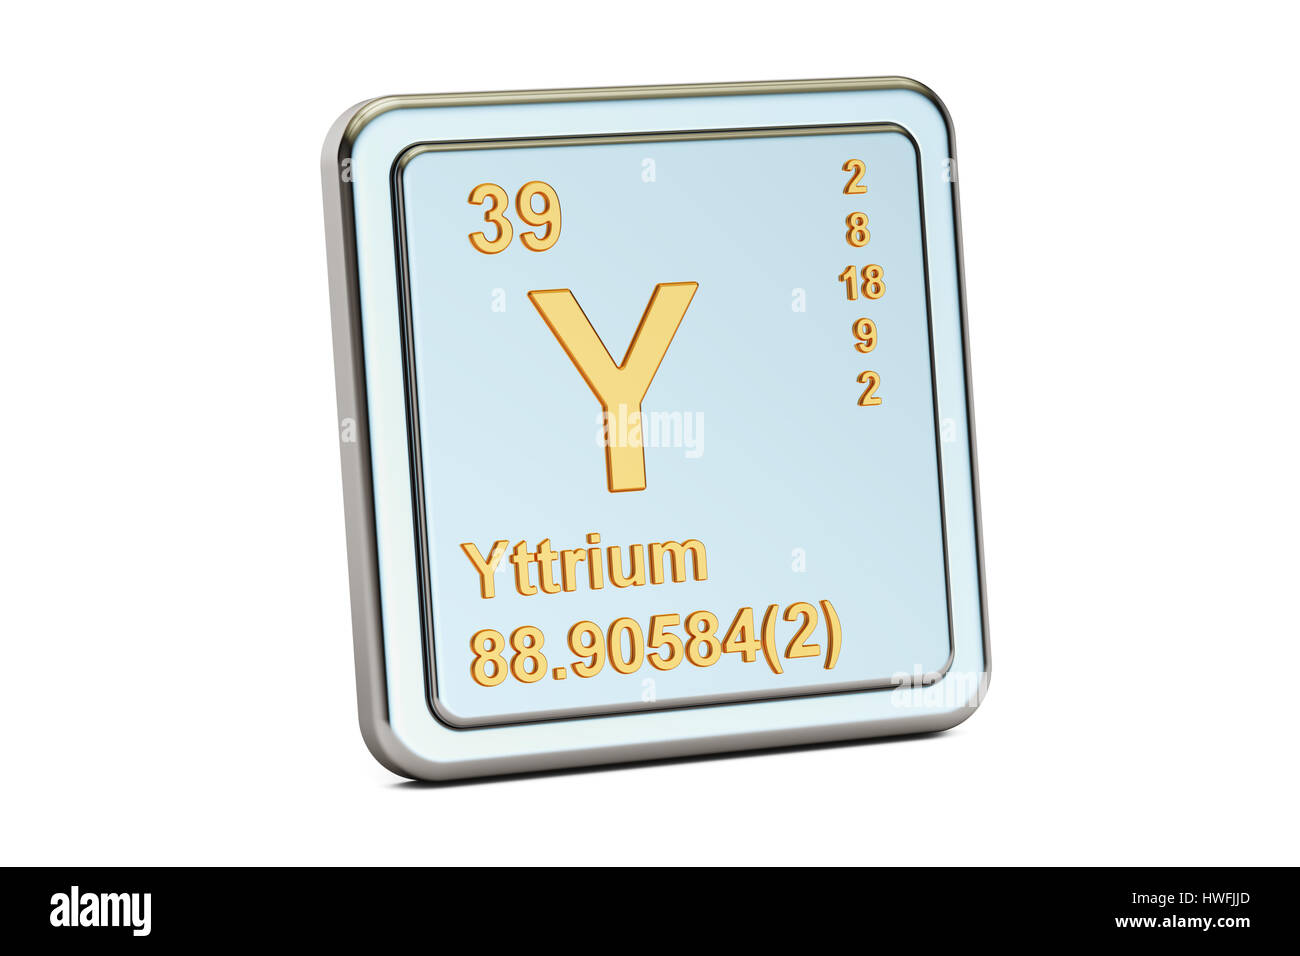 Yttrium Chemical Element Stock Photos Yttrium Chemical Element